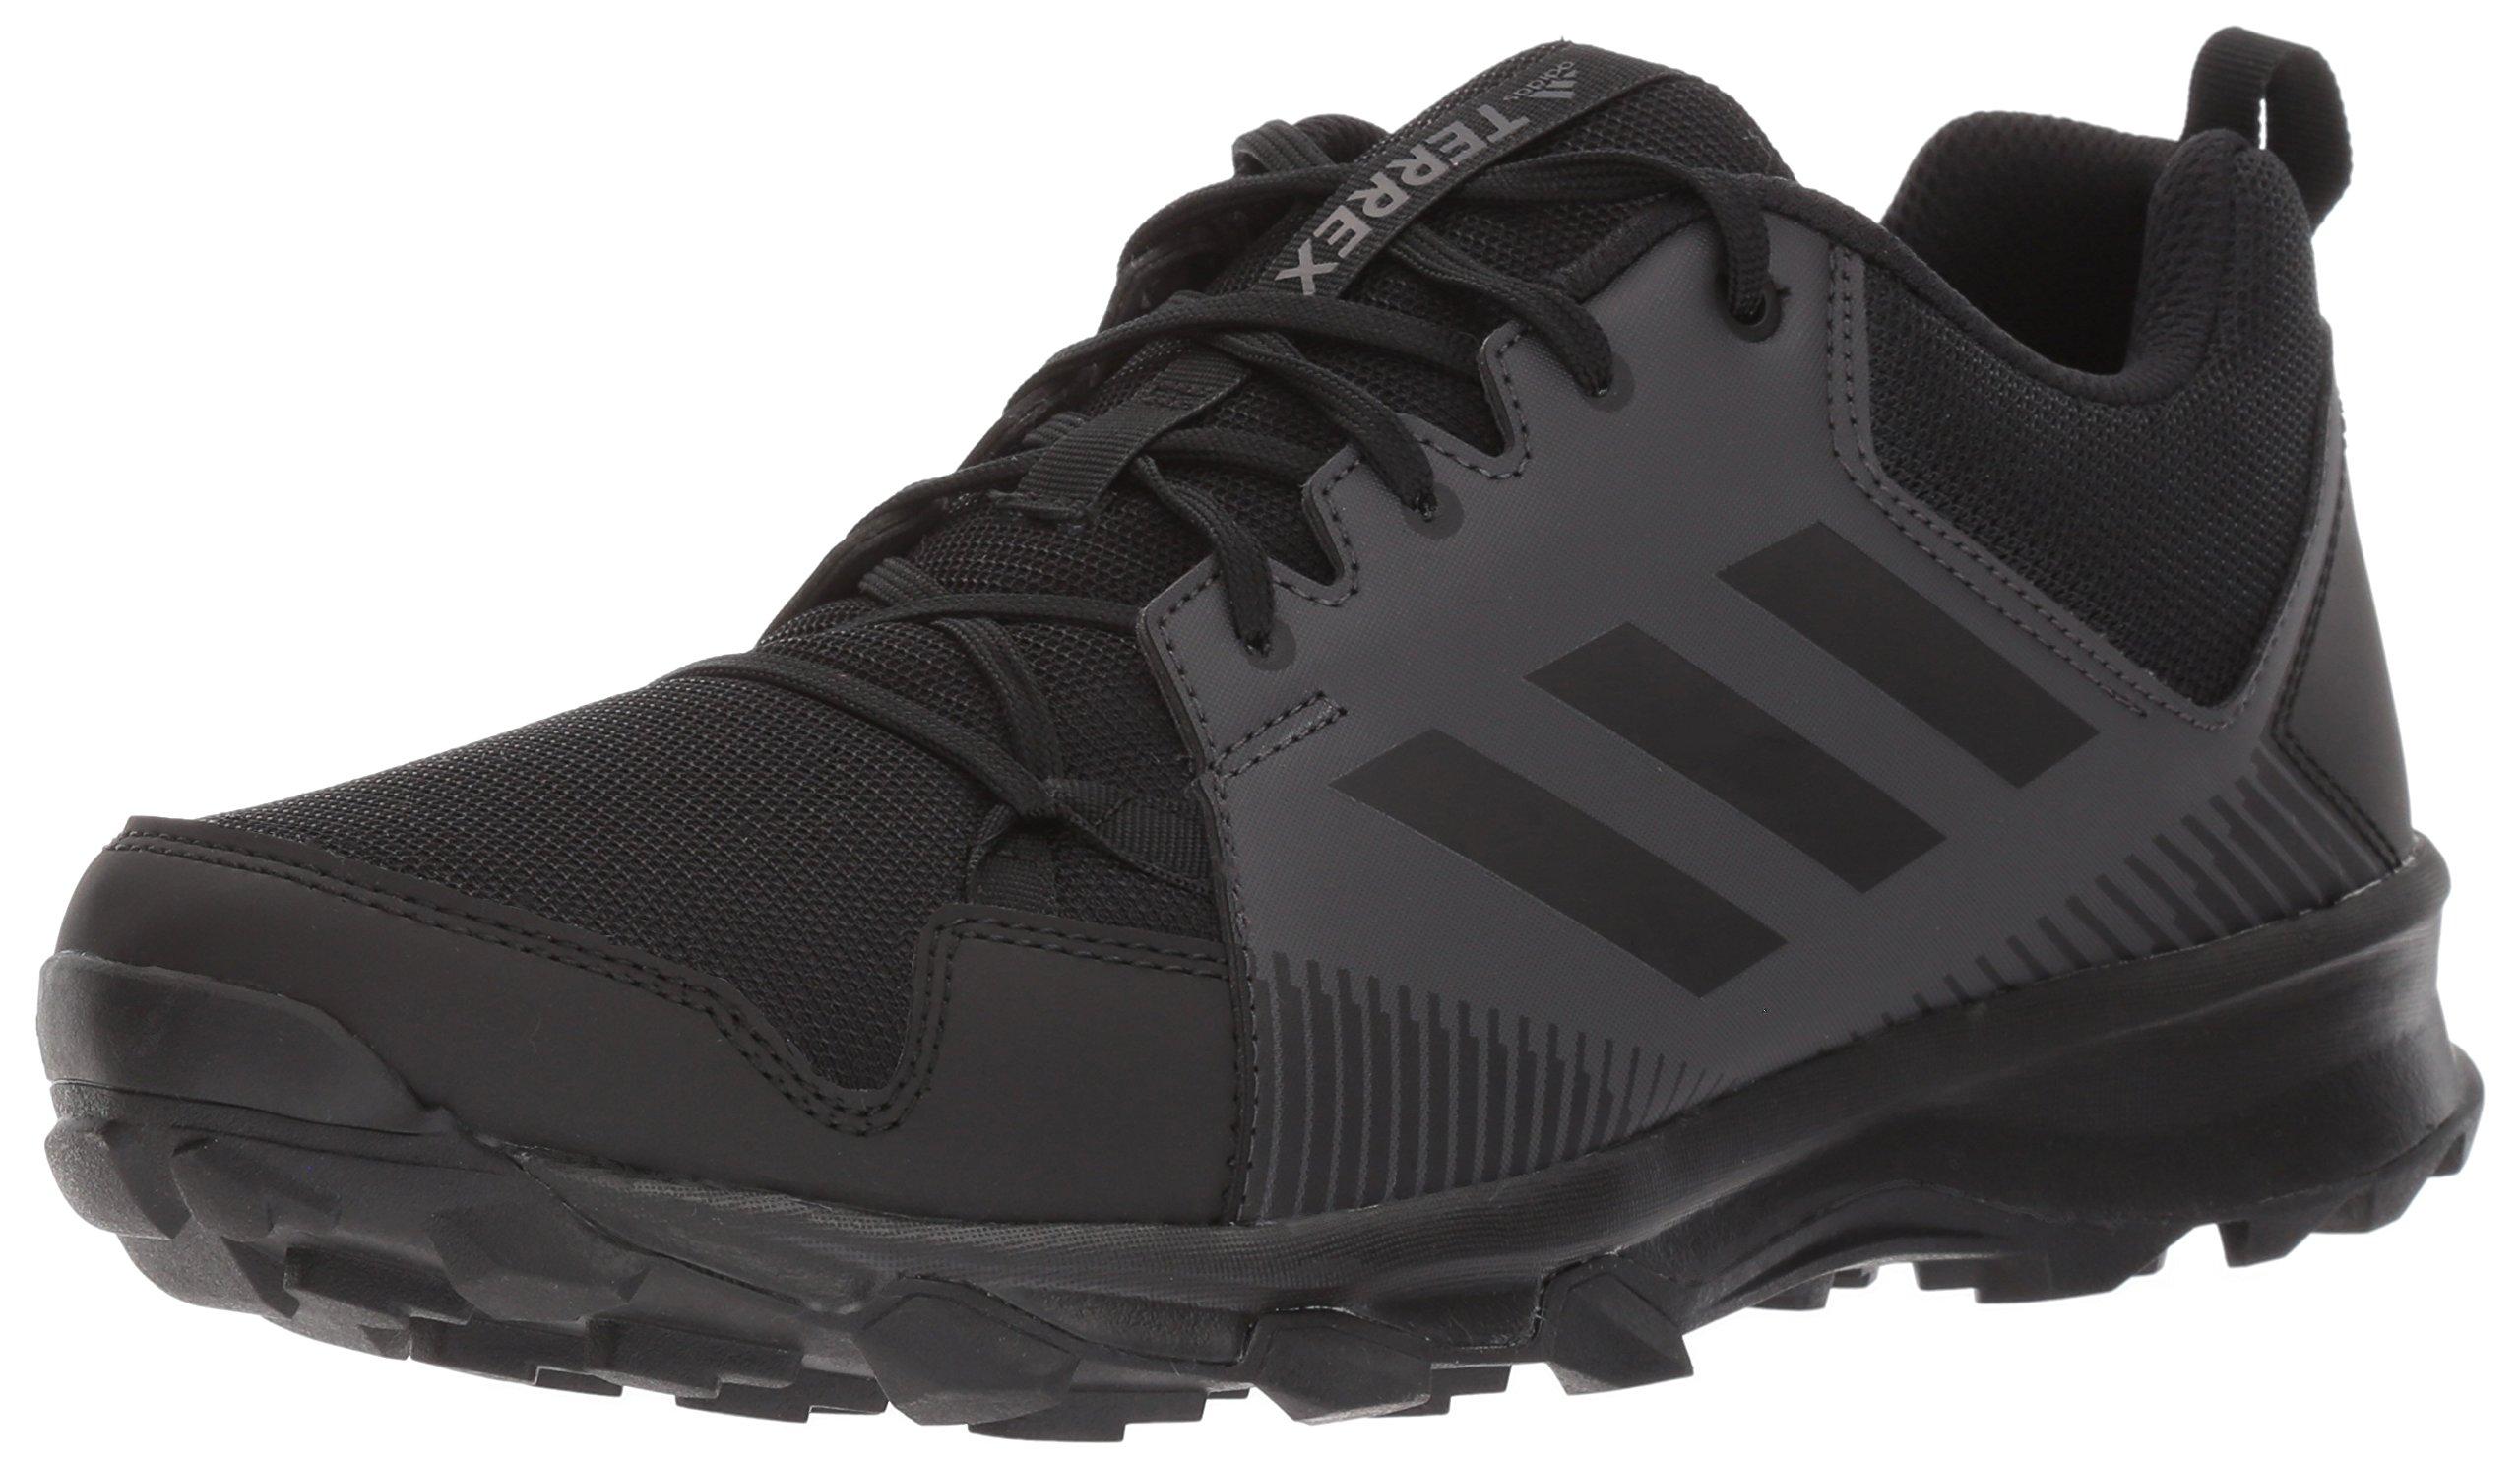 adidas outdoor Men's Terrex Tracerocker Trail Running Shoe, Black/Black/Utility Black, 10 D US